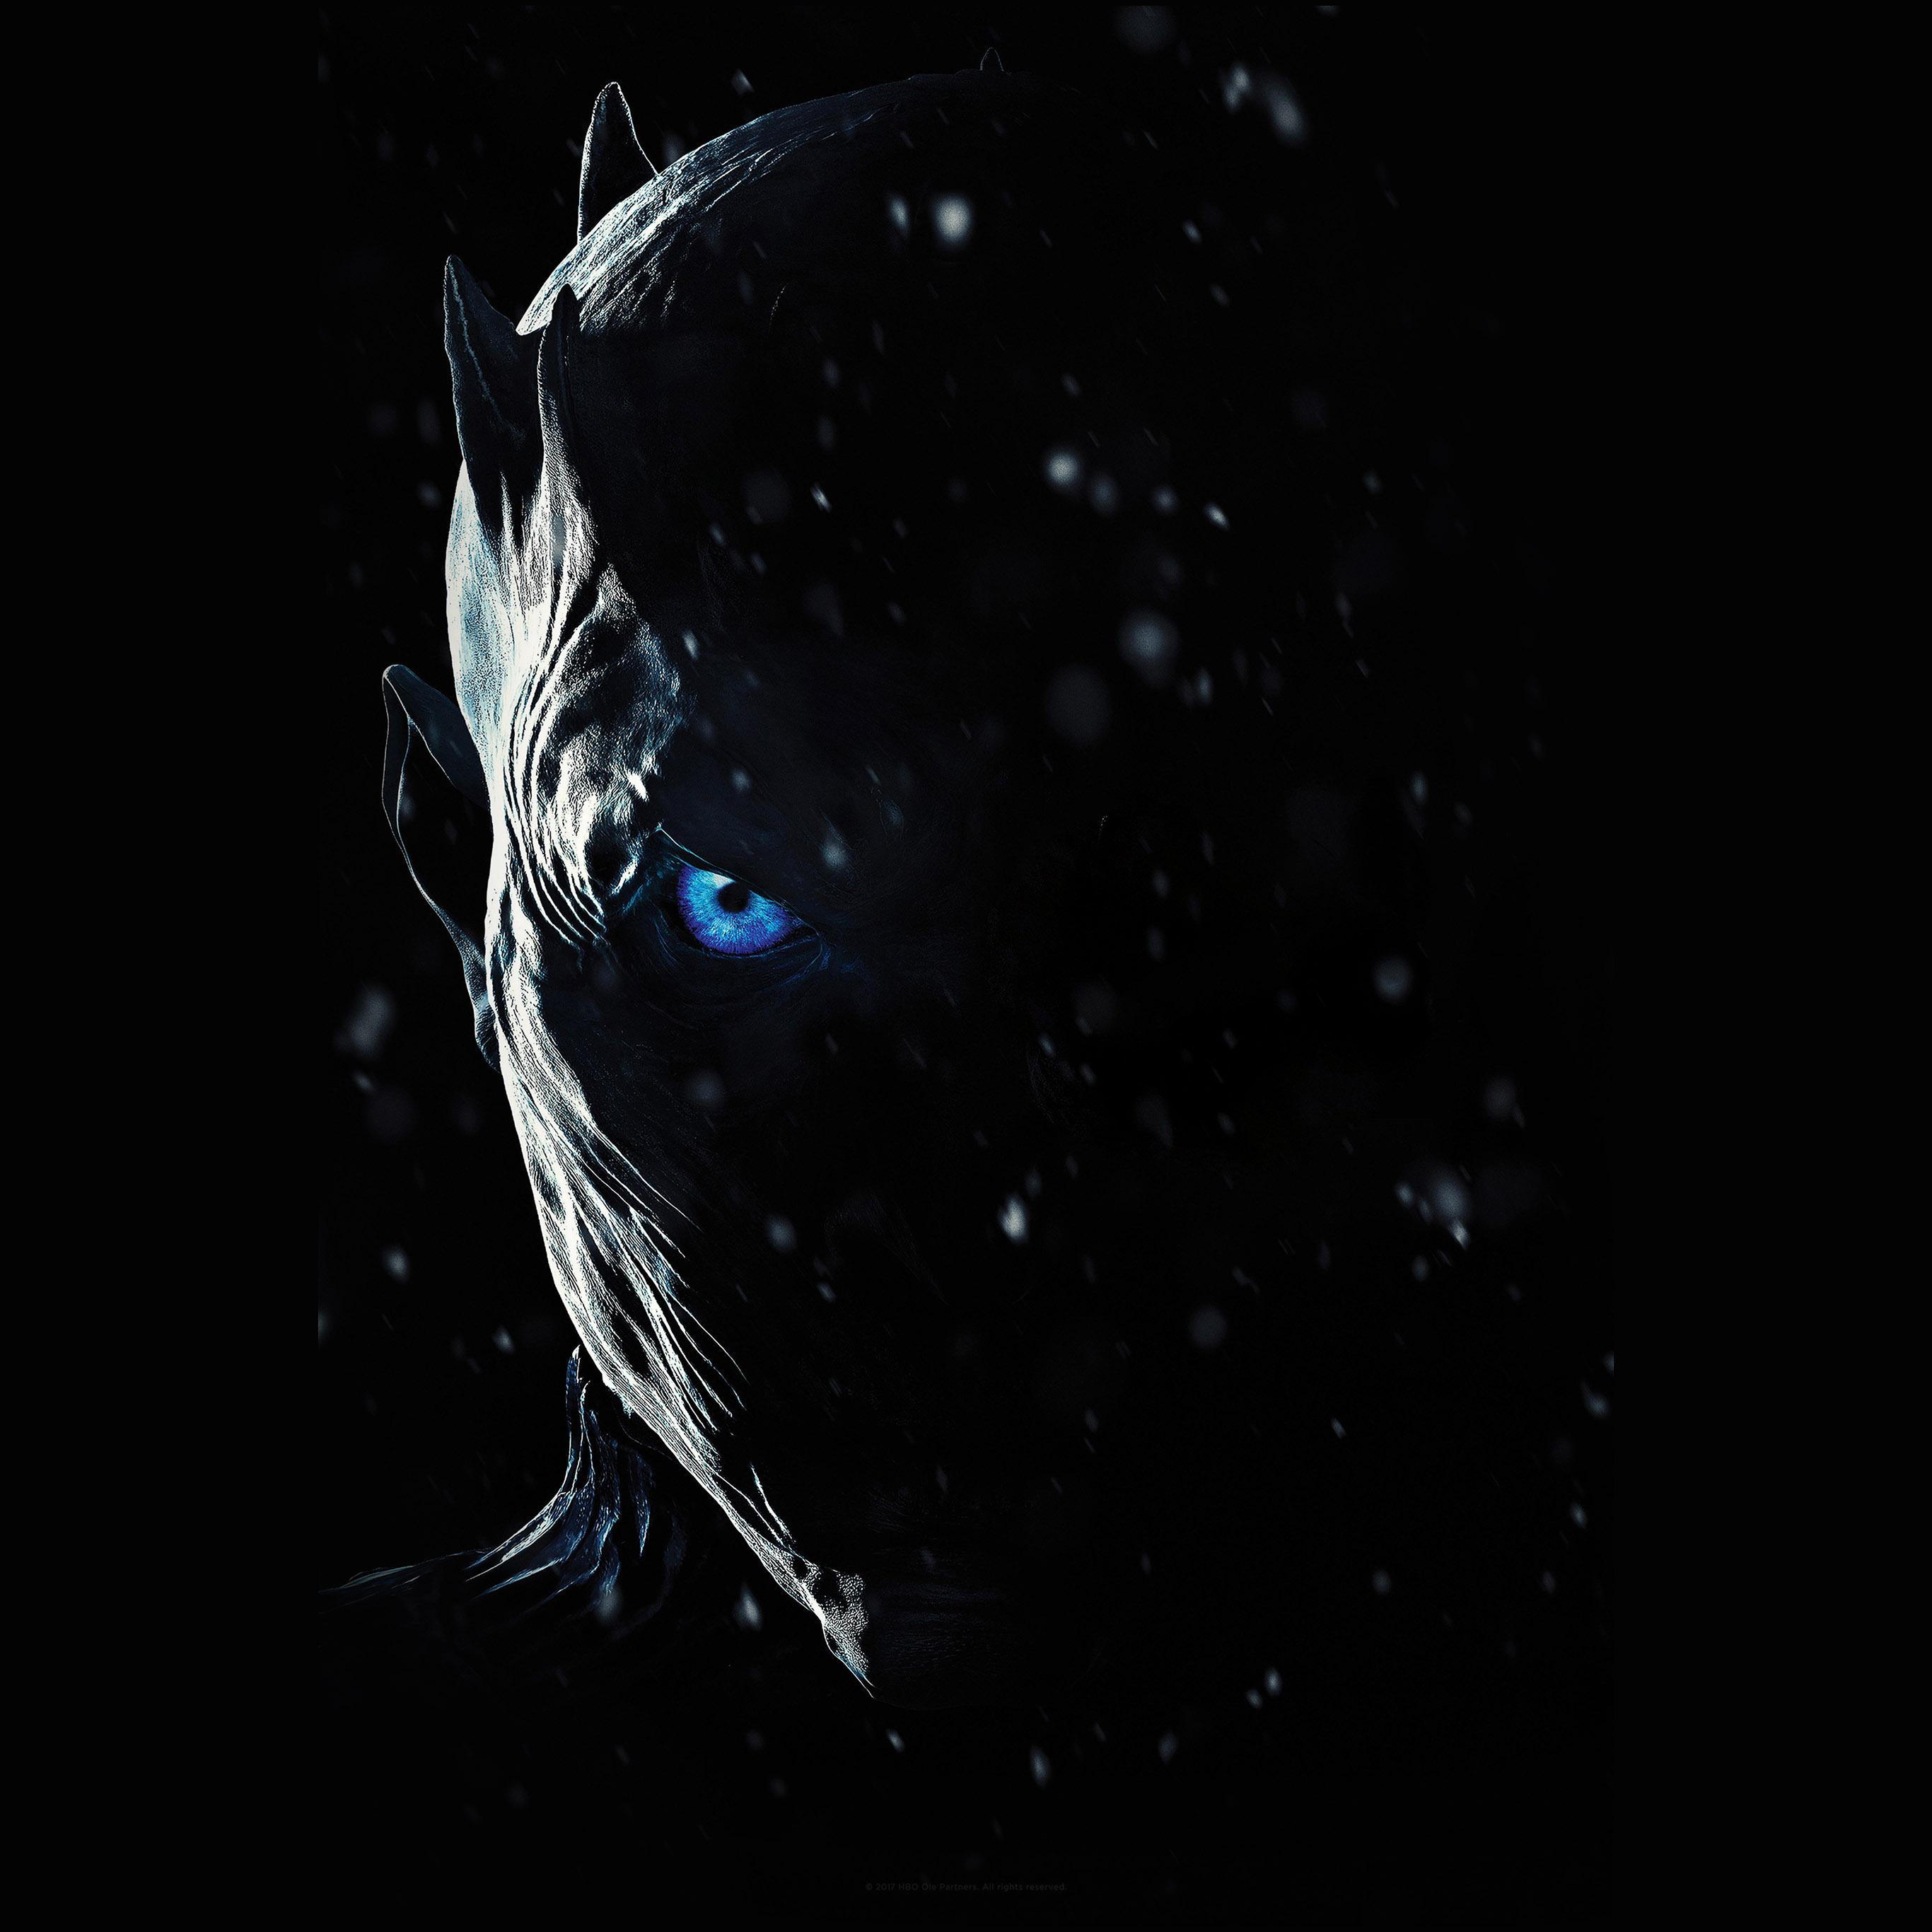 Season 7 Game Of Thrones Night King - HD Wallpaper